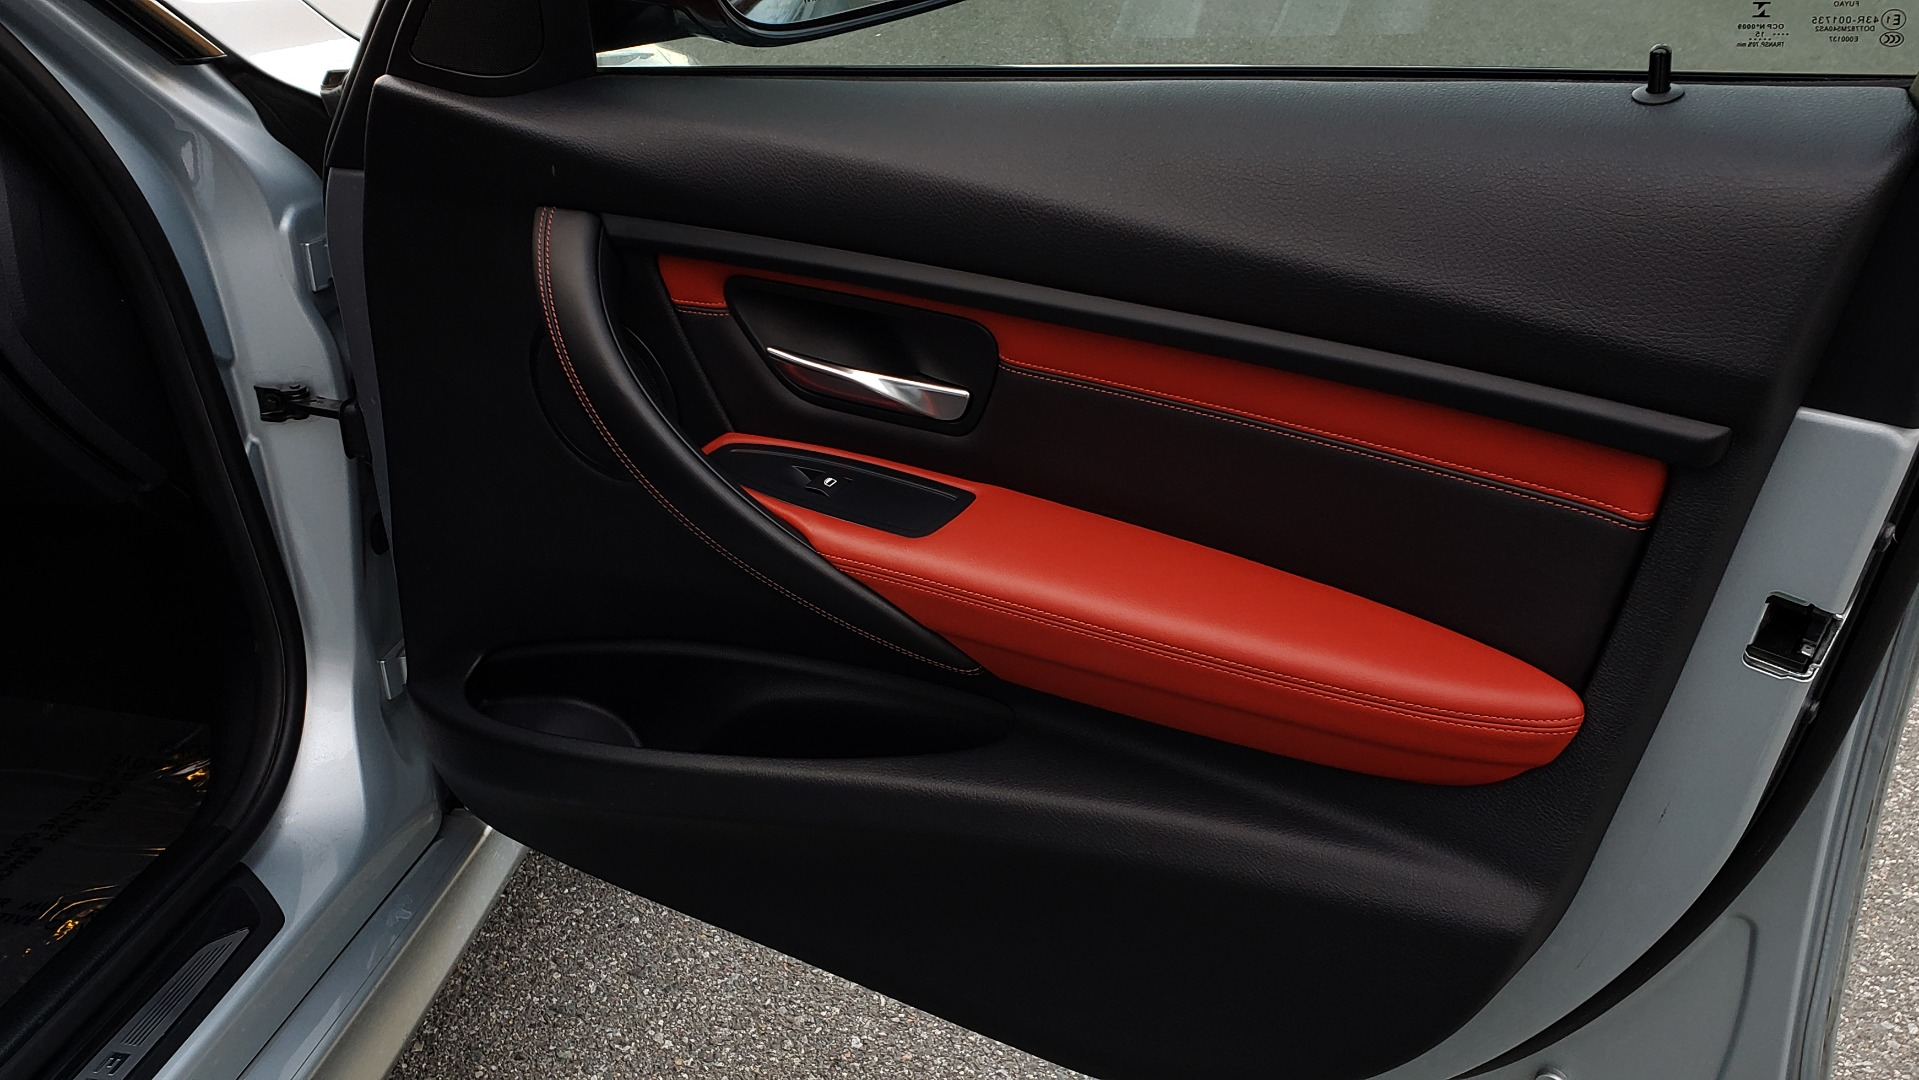 Used 2015 BMW M3 EXECUTIVE PKG / NAV / CAMERA / HUD / CARBON FIBER ROOF for sale Sold at Formula Imports in Charlotte NC 28227 75